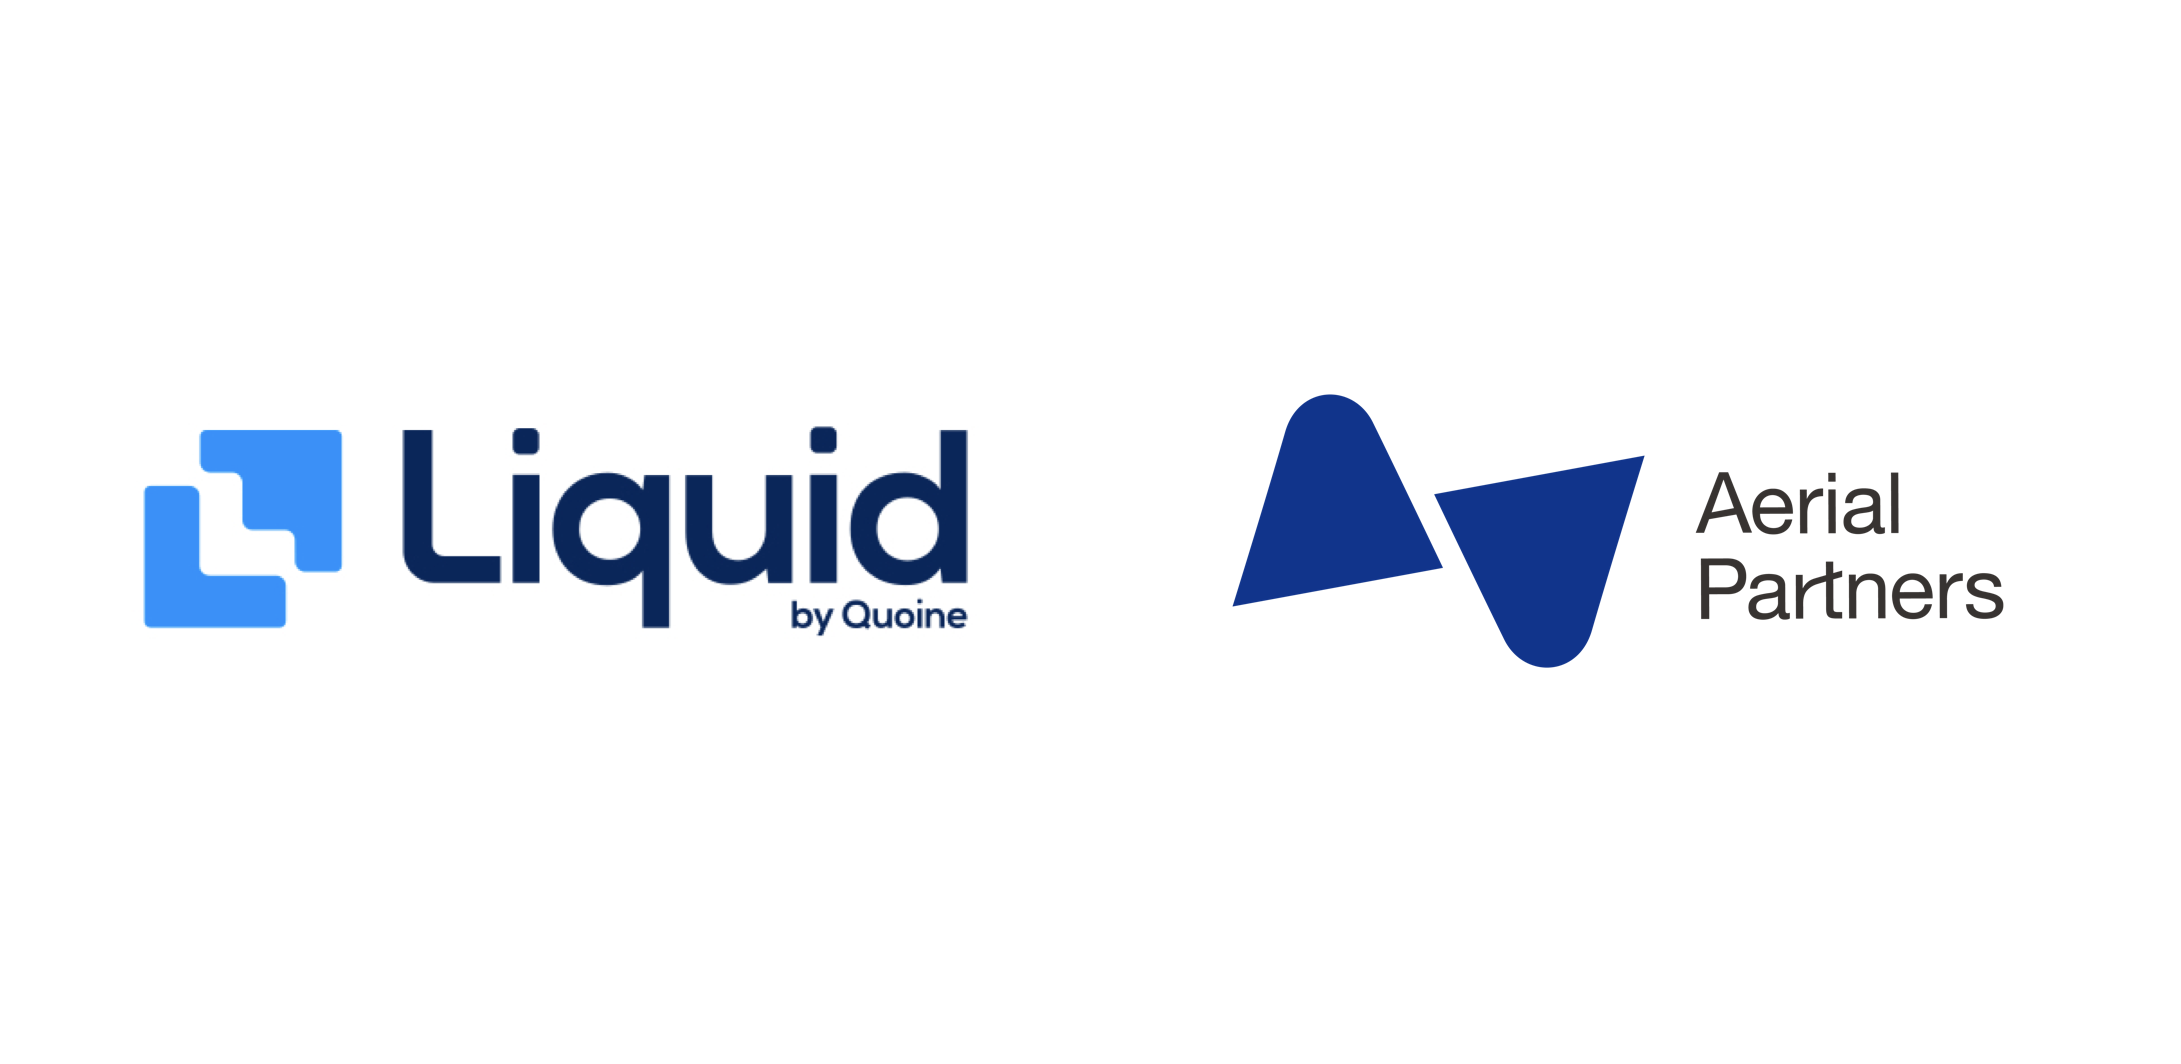 QUOINE、Aerial Partnersと業務提携を発表〜簡単に仮想通貨の税金計算ができるオンラインツールを提供〜